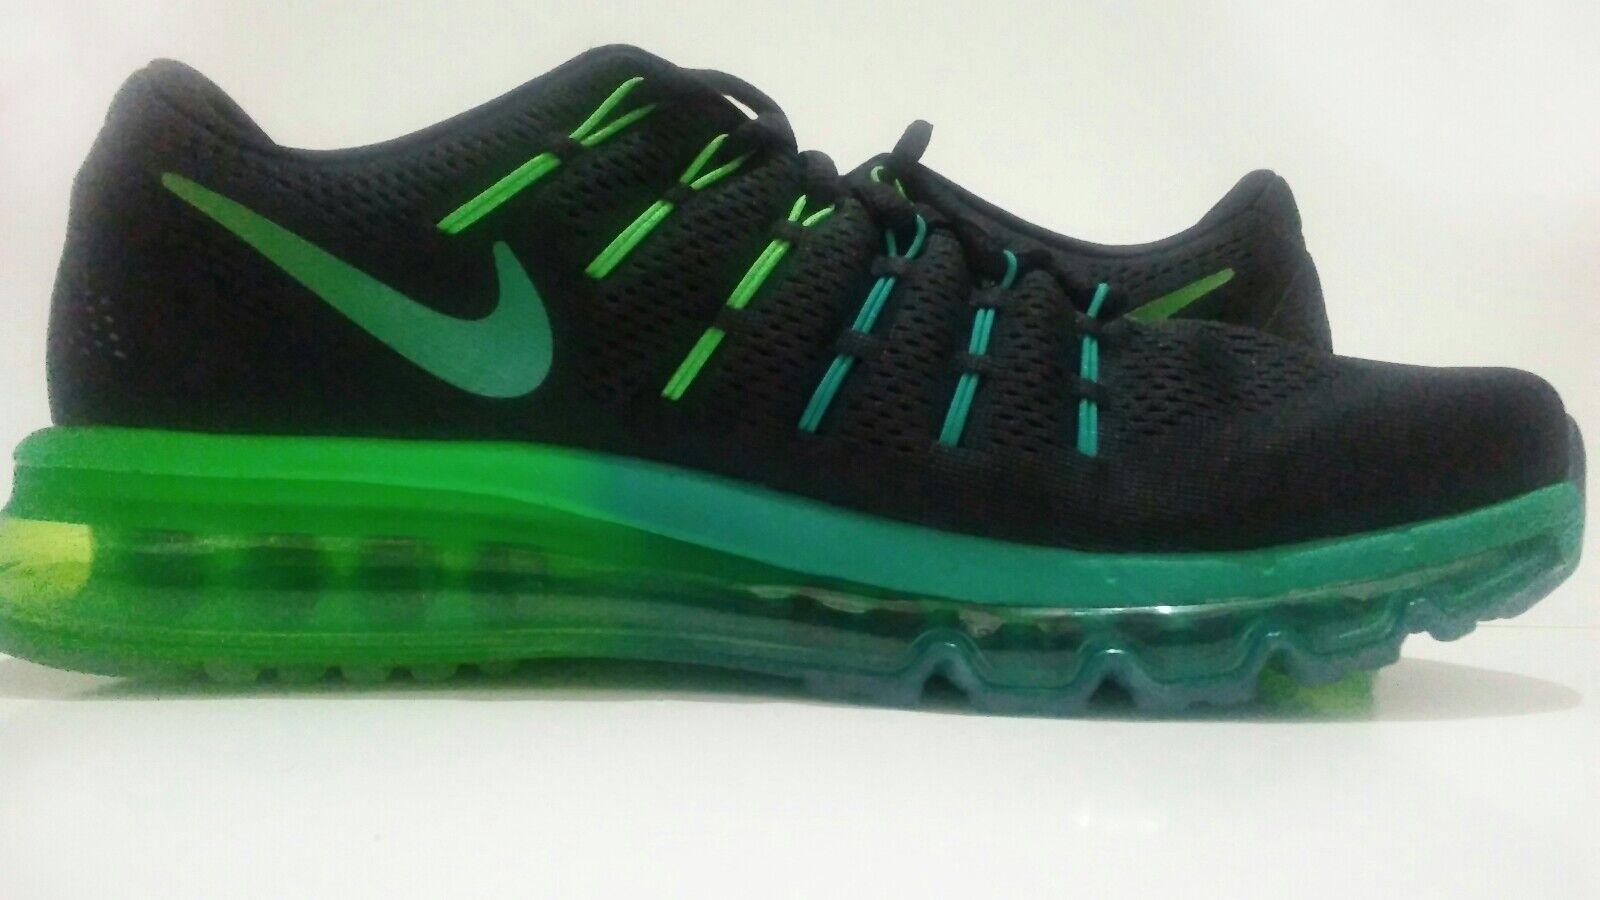 Nike air max turq multi - 806771-003 color midnight 2016 schwarz 806771-003 - mens sz 9,5 3235f4